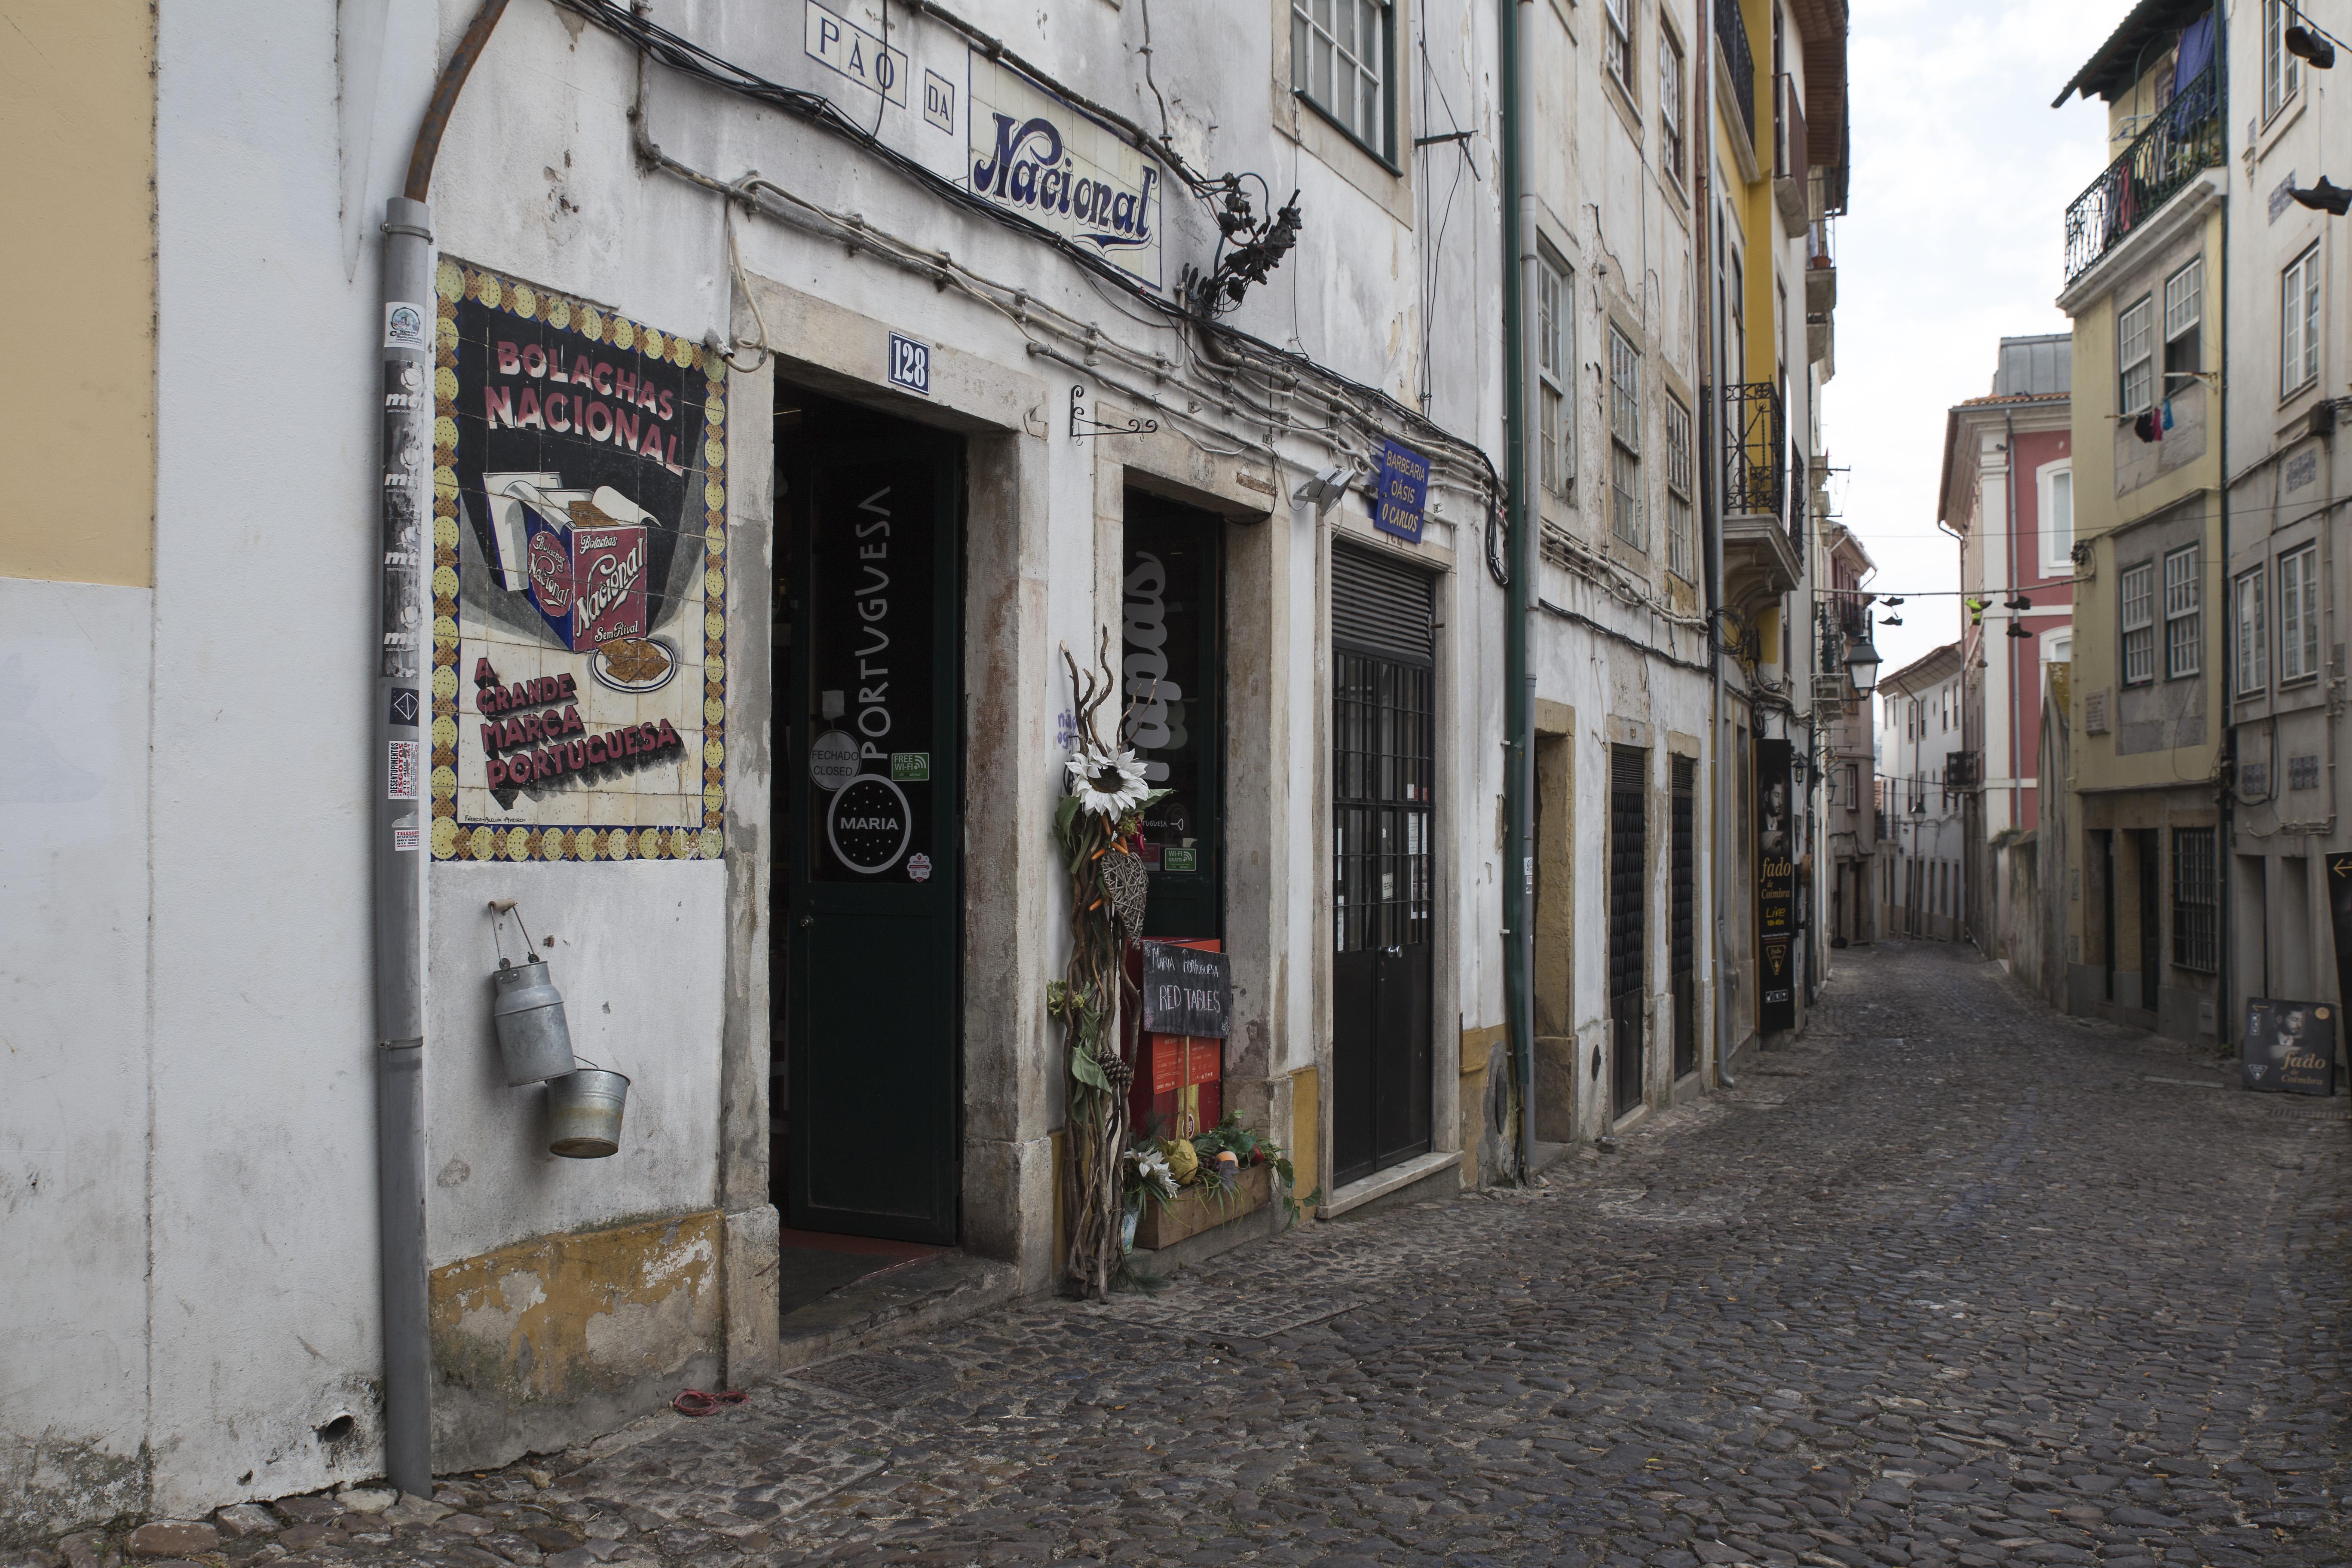 Portugal, Coimbra (2018)